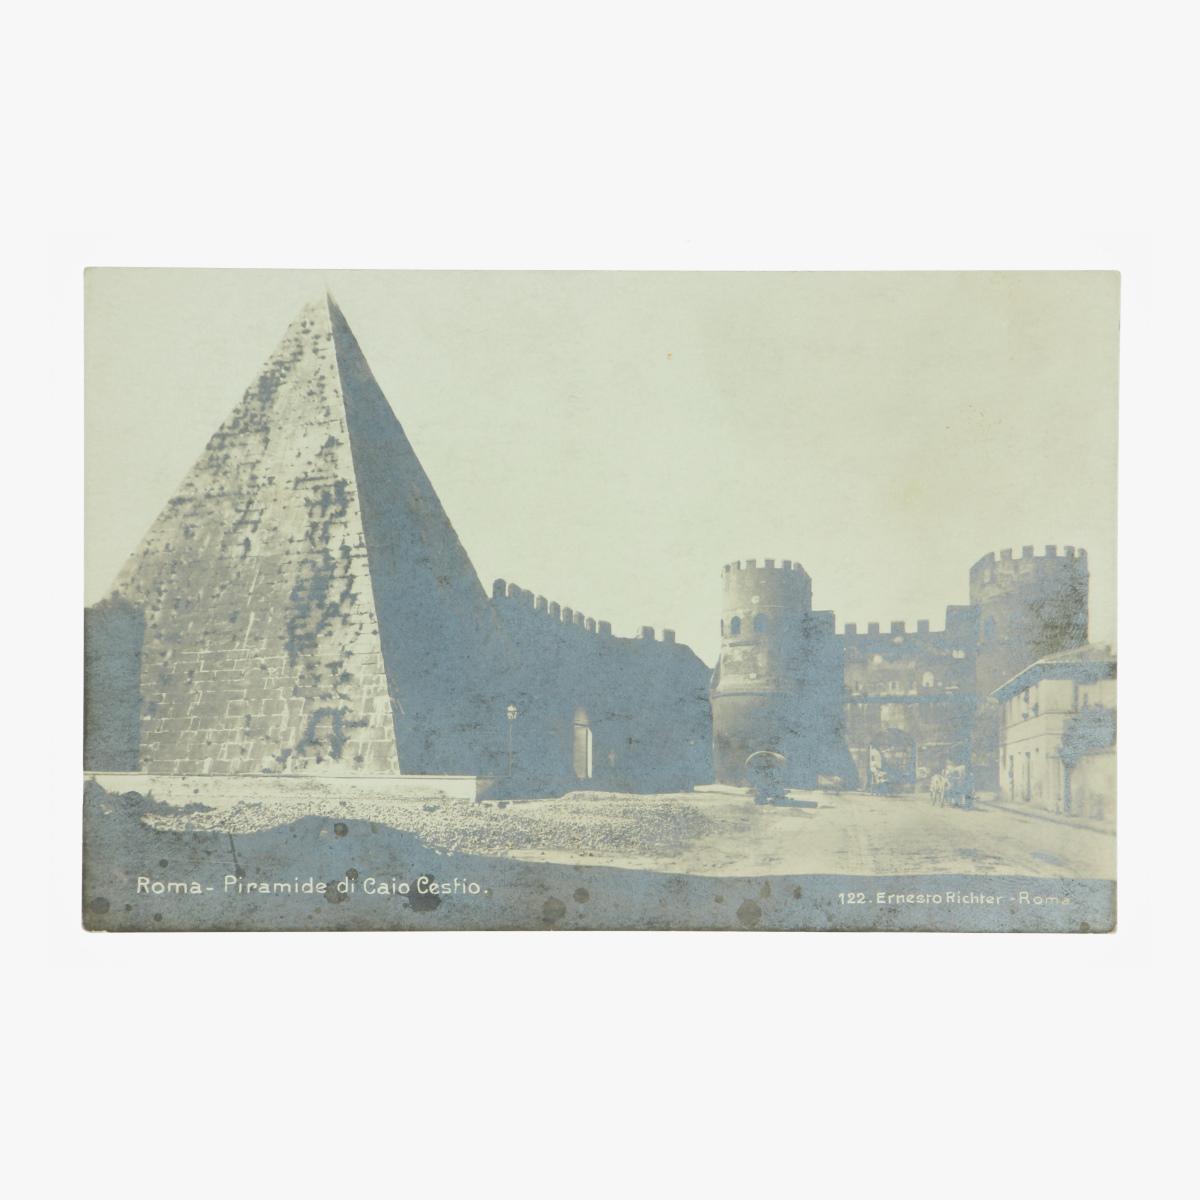 Afbeeldingen van Roma - Piramide di Caio Cestio. Postkaart Nr. 122 Ernesto Richter